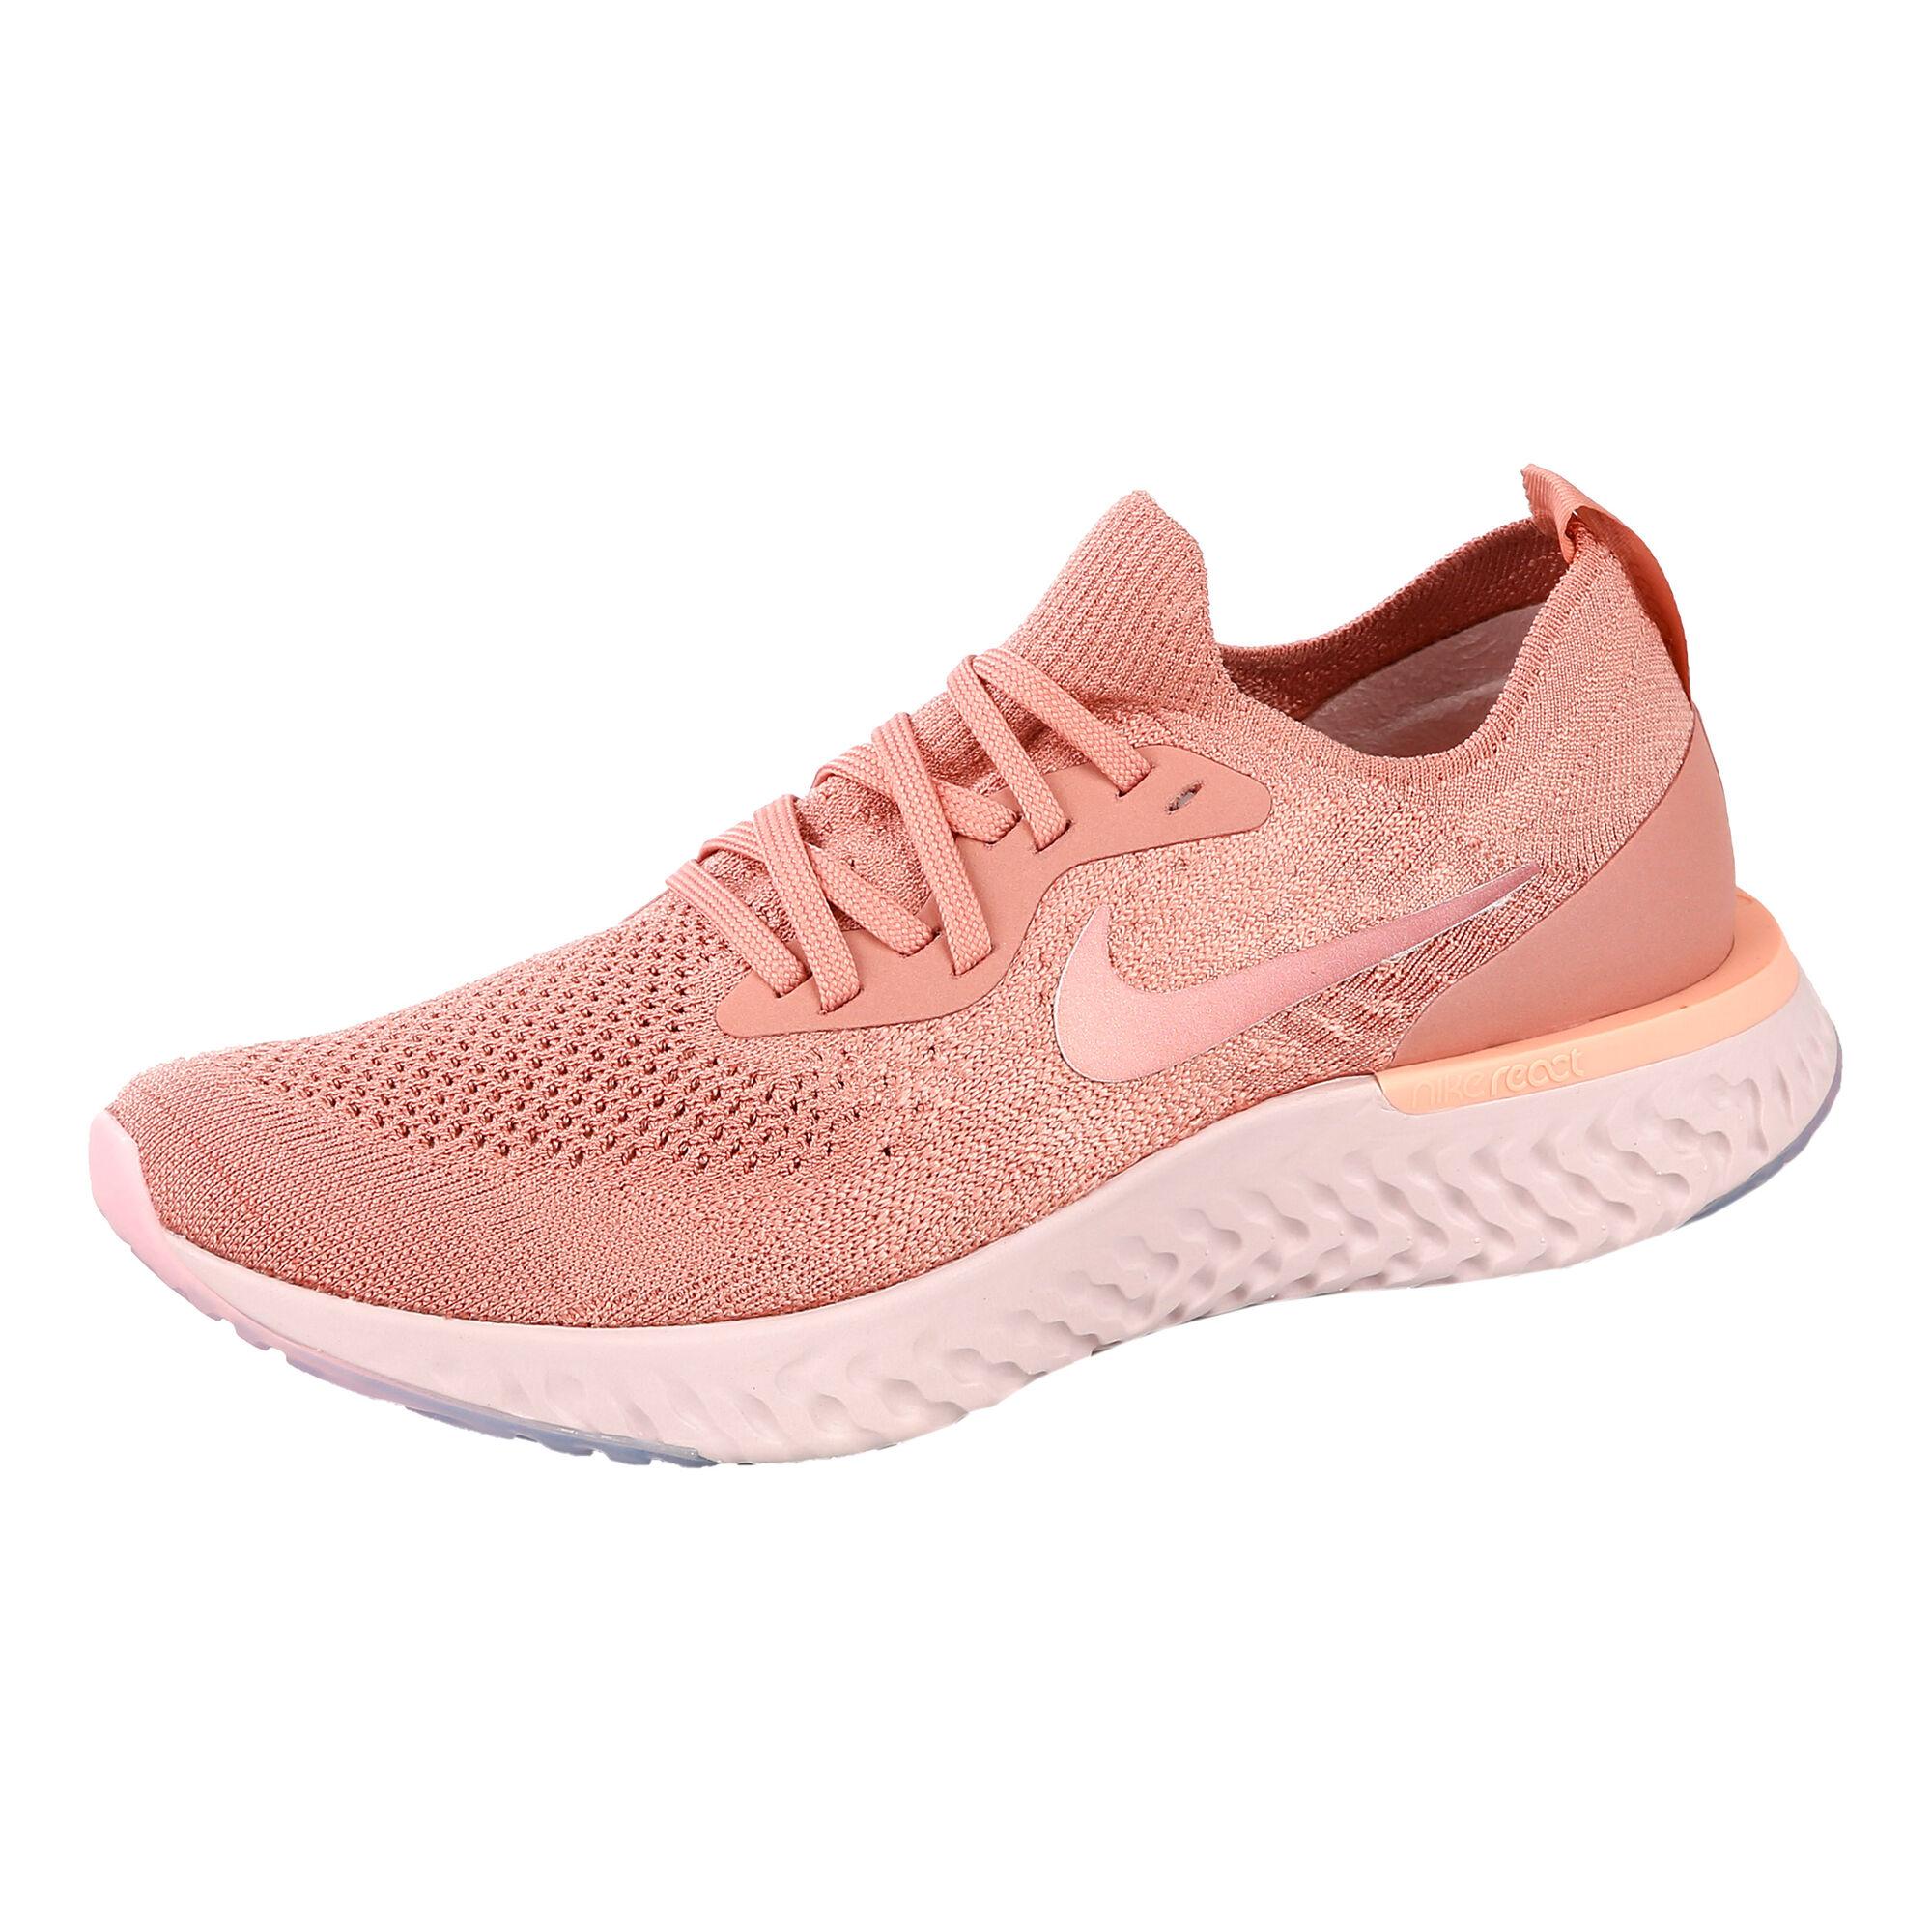 d9730275bb2fc Nike  Nike  Nike  Nike  Nike  Nike  Nike  Nike. Epic React Flyknit ...